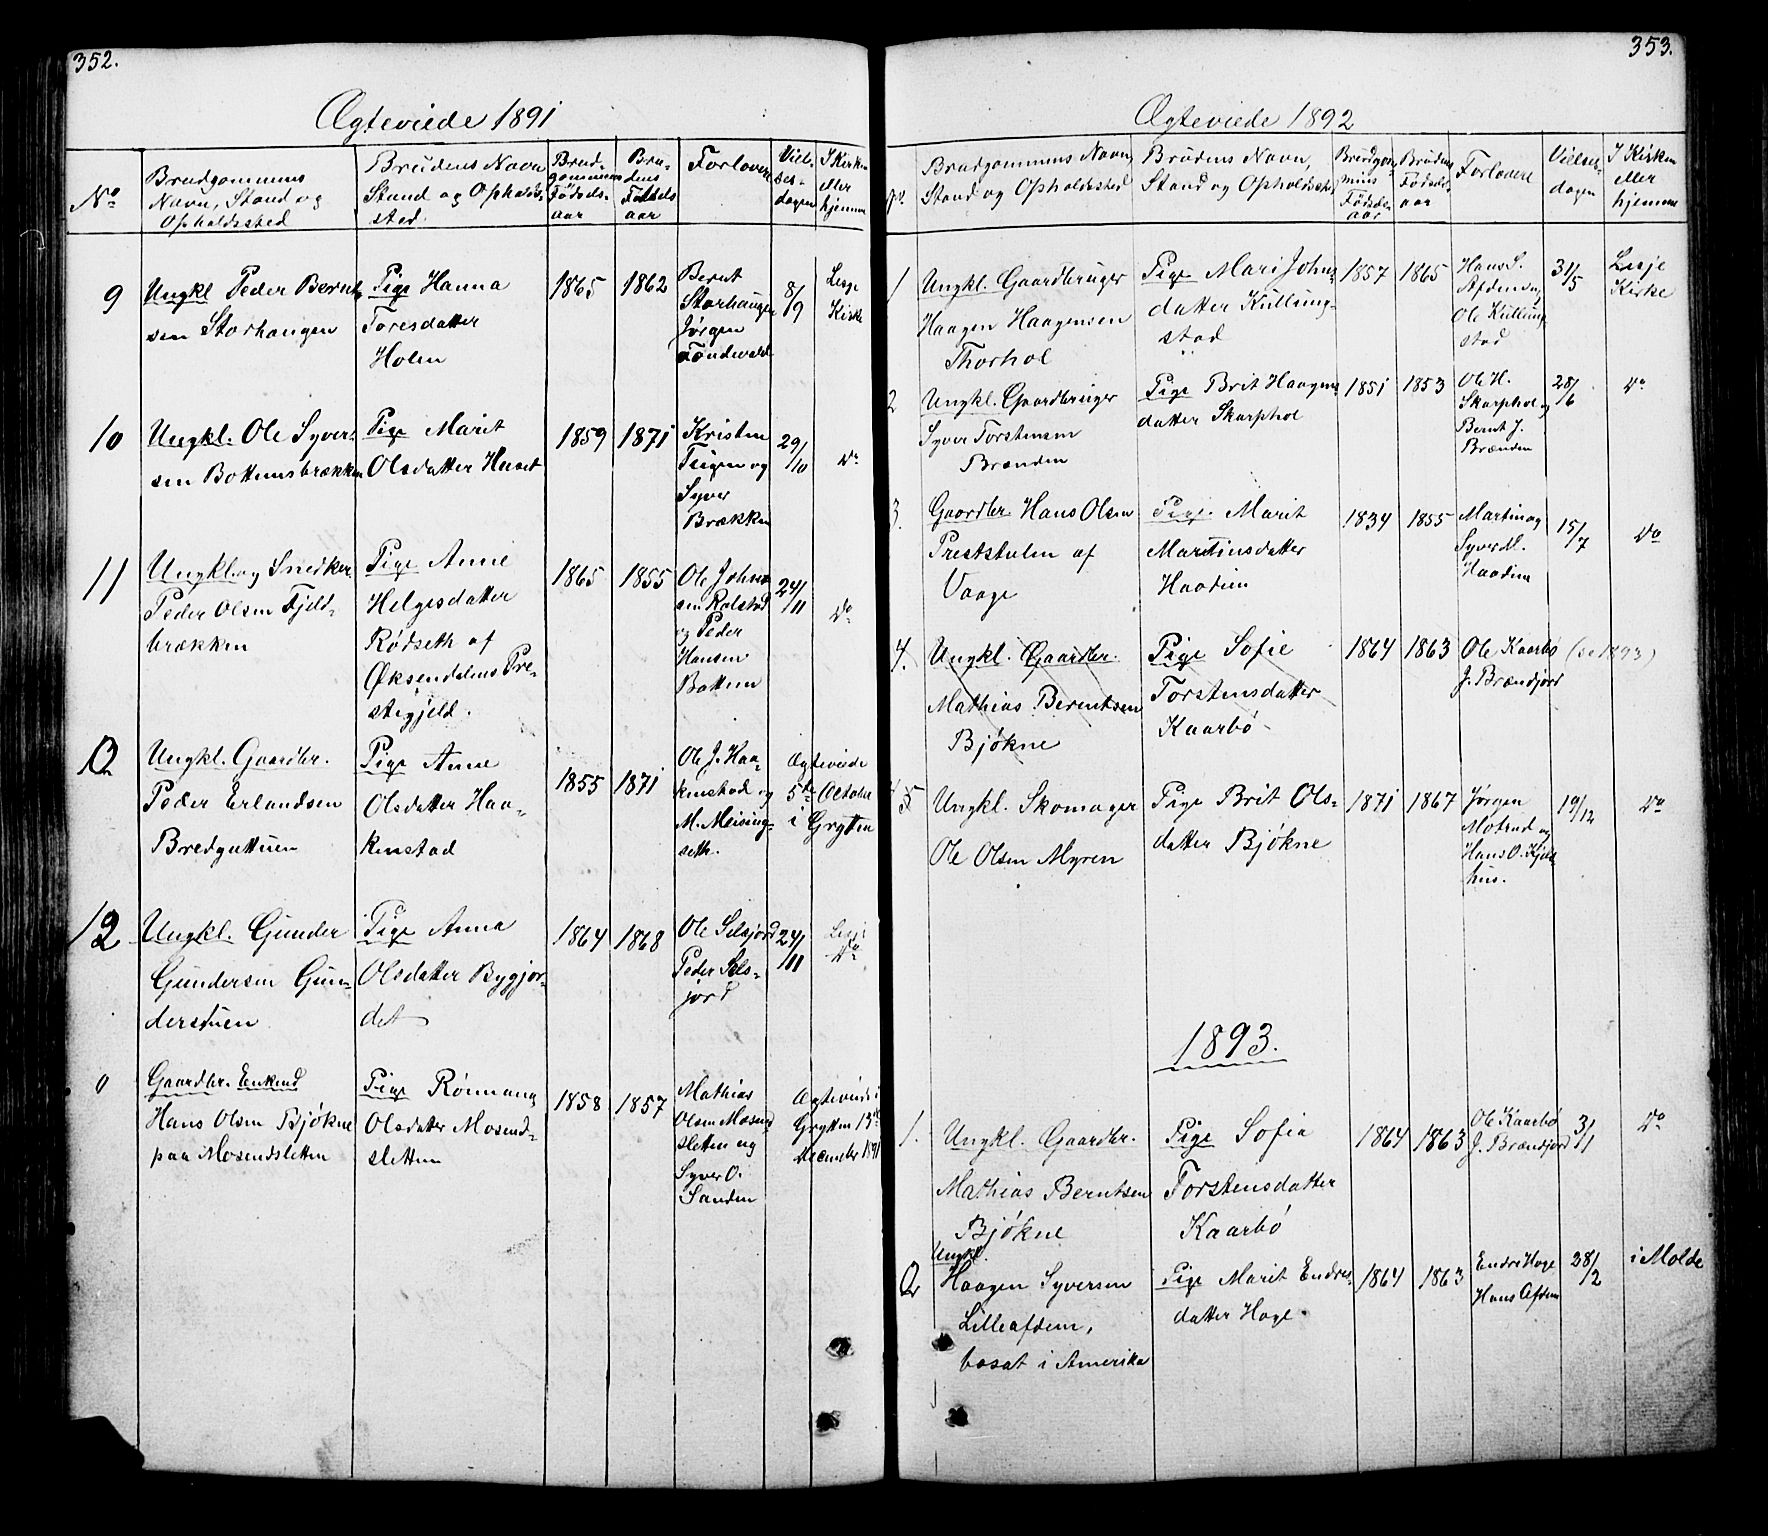 SAH, Lesja prestekontor, Klokkerbok nr. 5, 1850-1894, s. 352-353